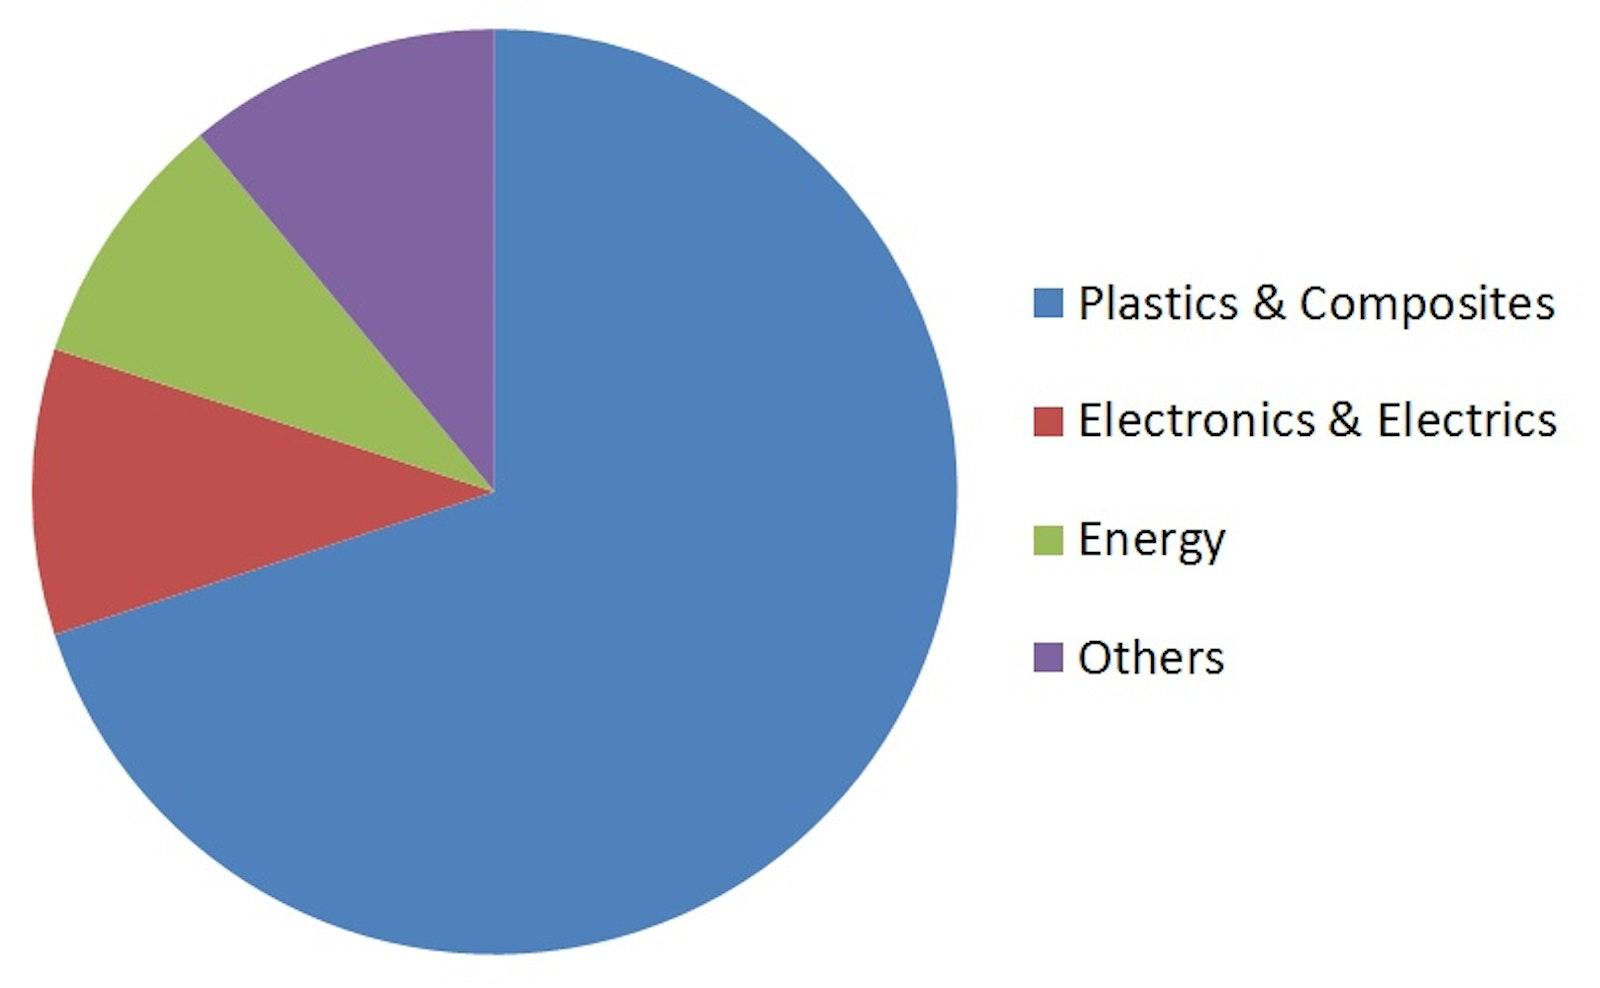 Carbon Nanotubes (CNT) for Electronics & Electrics 2013-2023